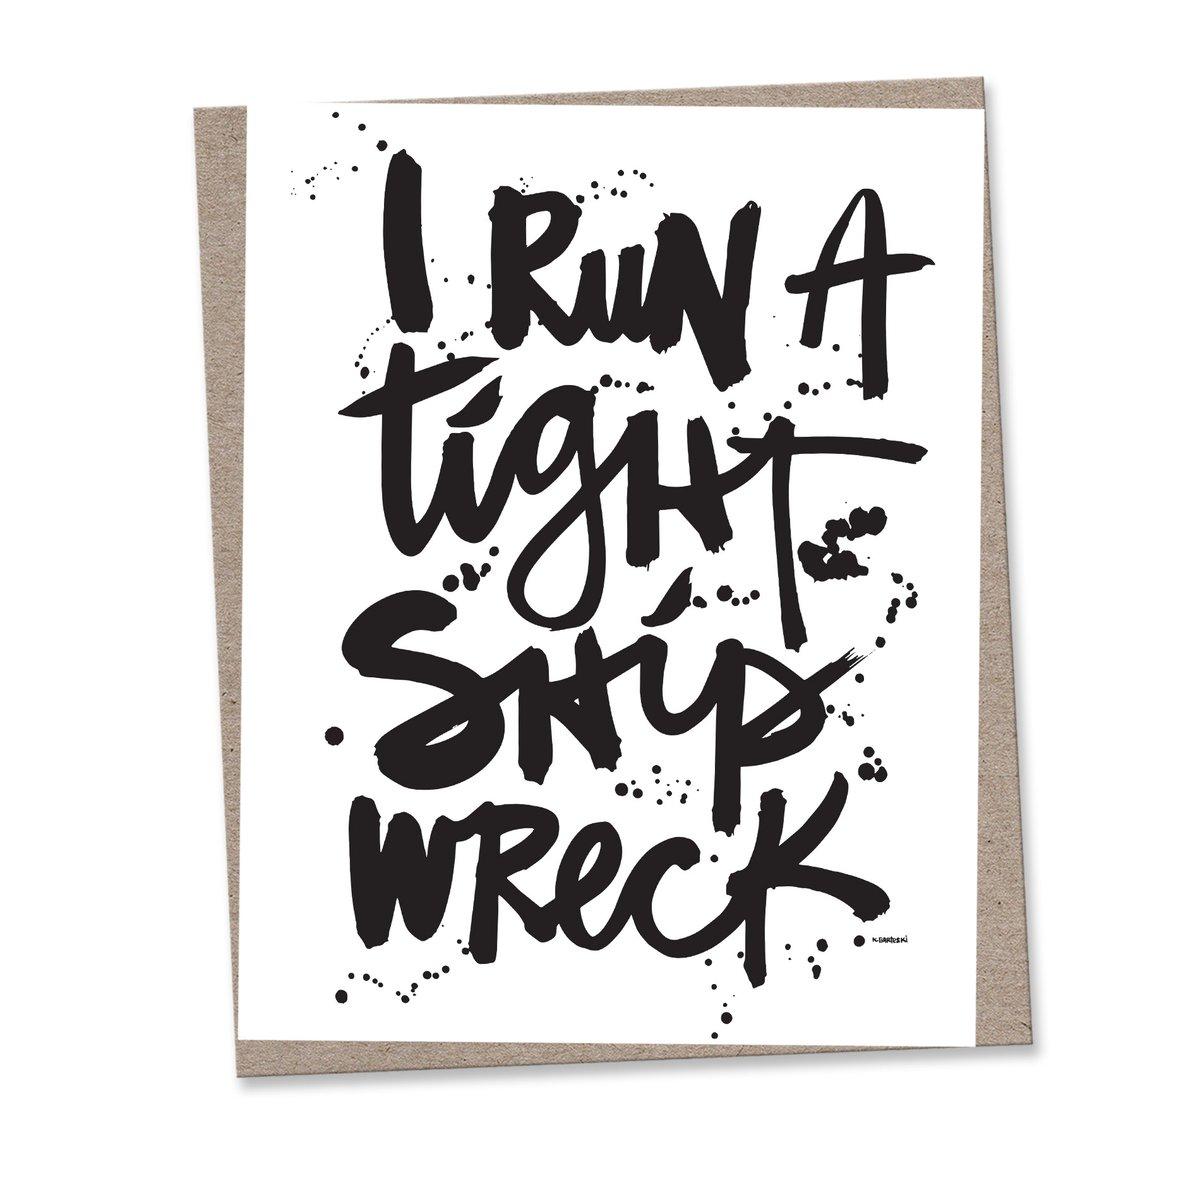 Image of SHIP WRECK #kbscript print